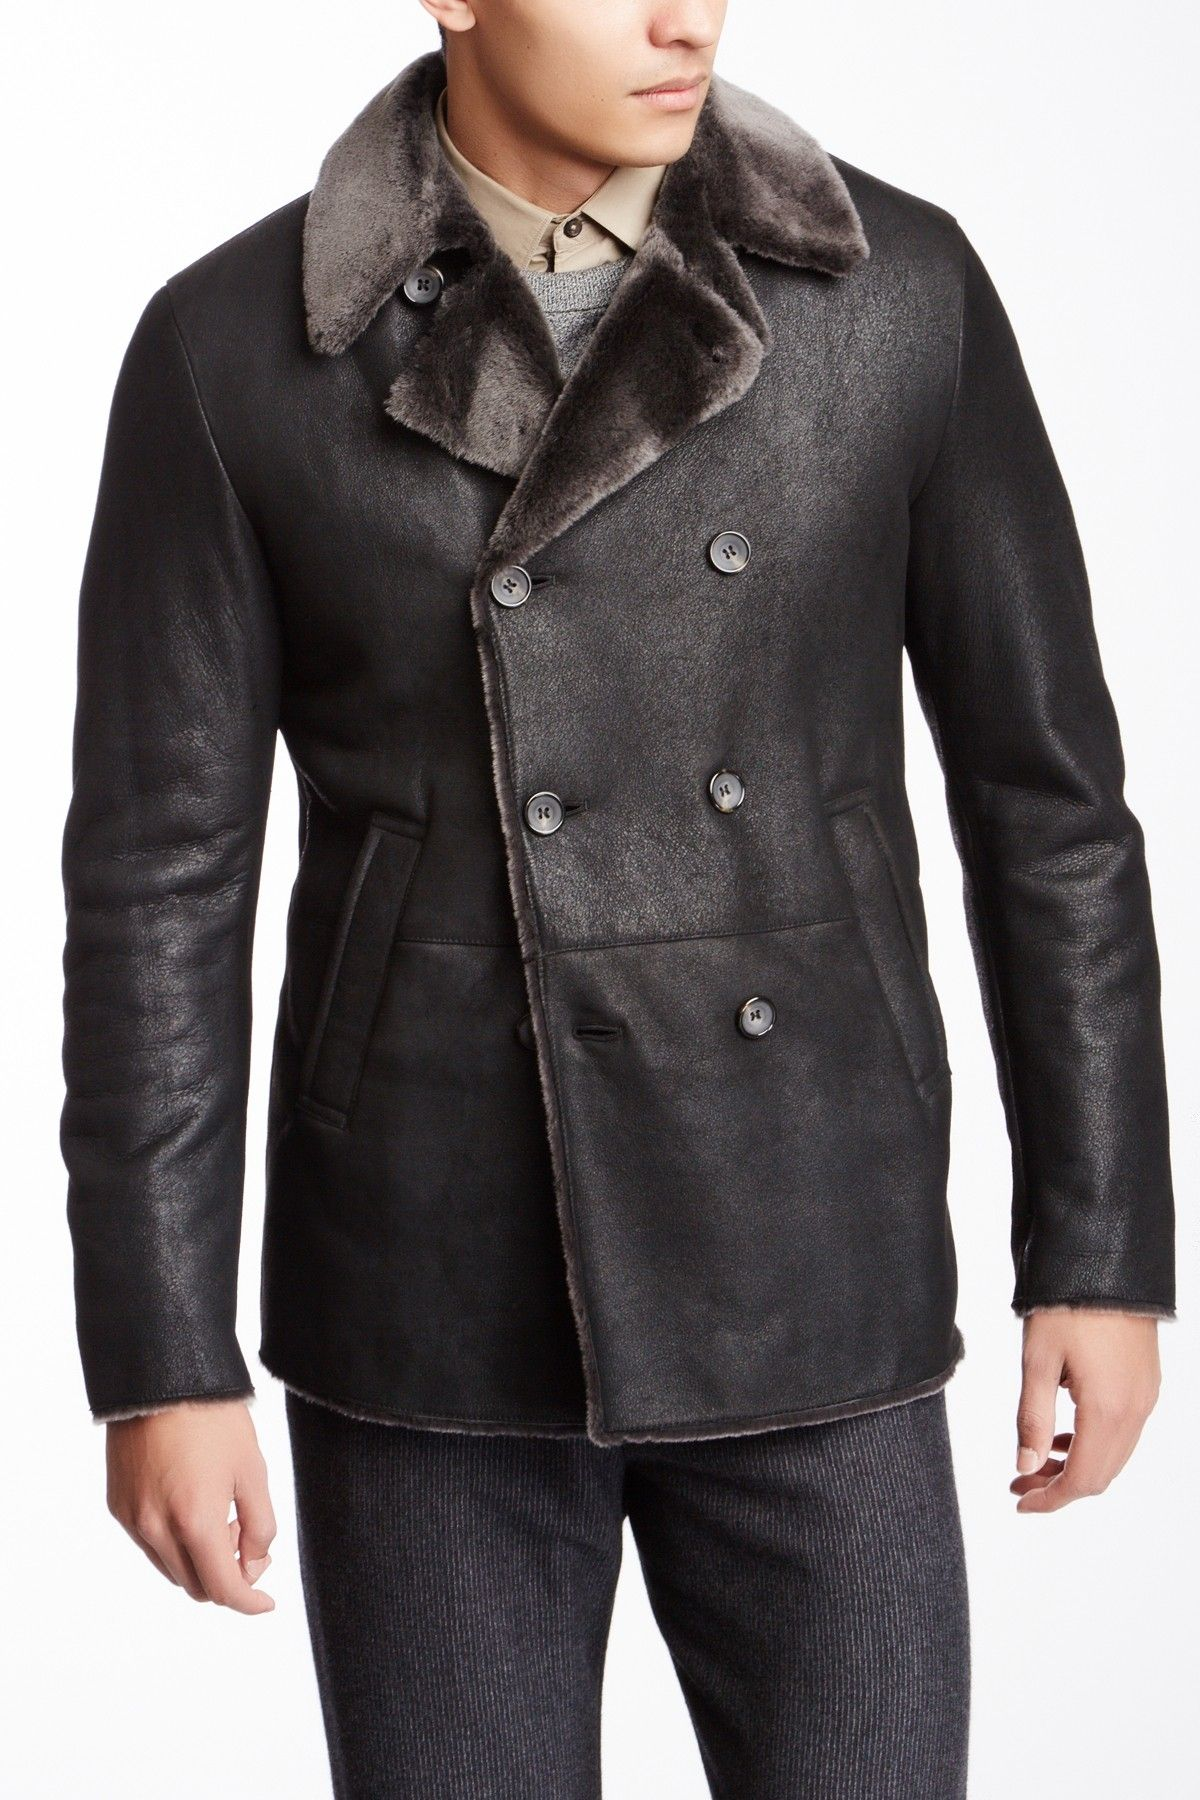 f128fde3 Giorgio Armani Uomo Leather Jacket with Fur Collar JacketMen ...